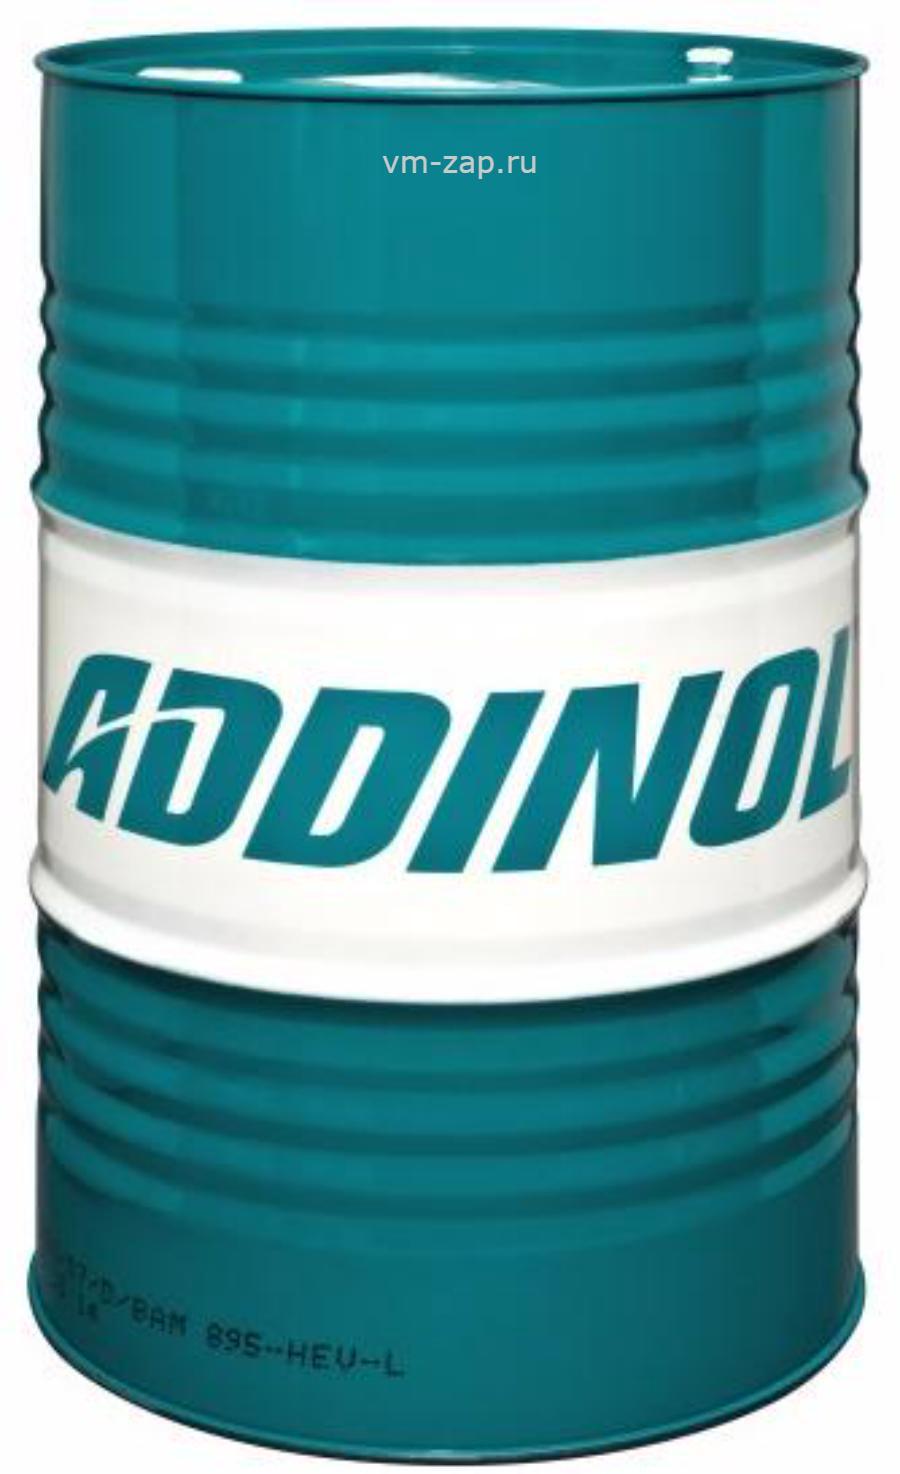 ADDINOL Super Power MV 0537 5W-30